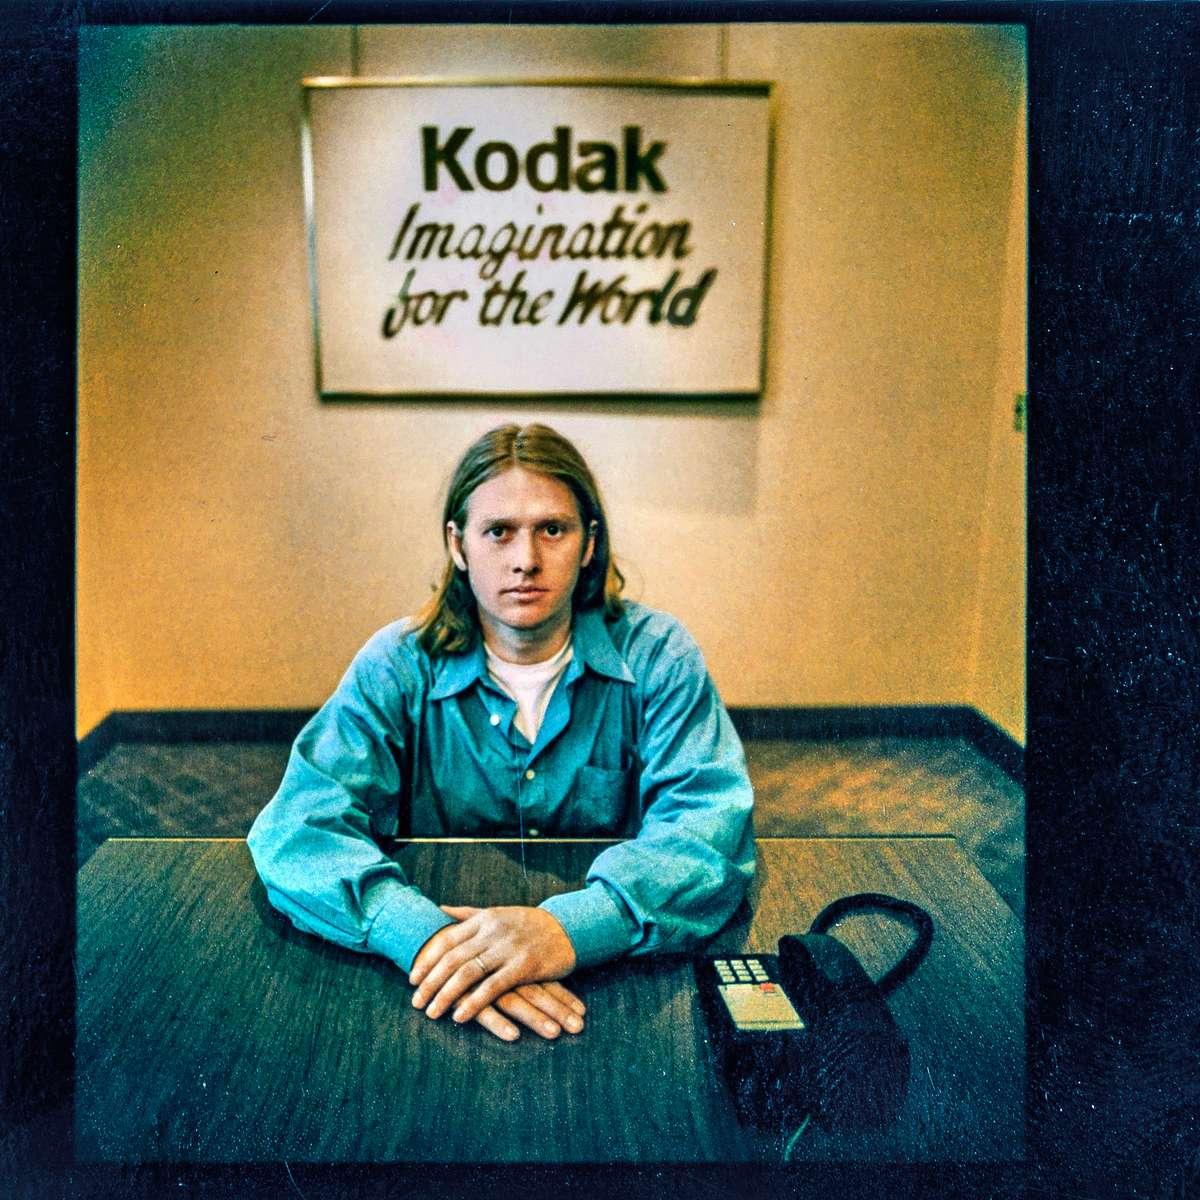 assistant_polaroid-polaroid_chris_kodak-9926-frank_veronsky_frank_veronsky